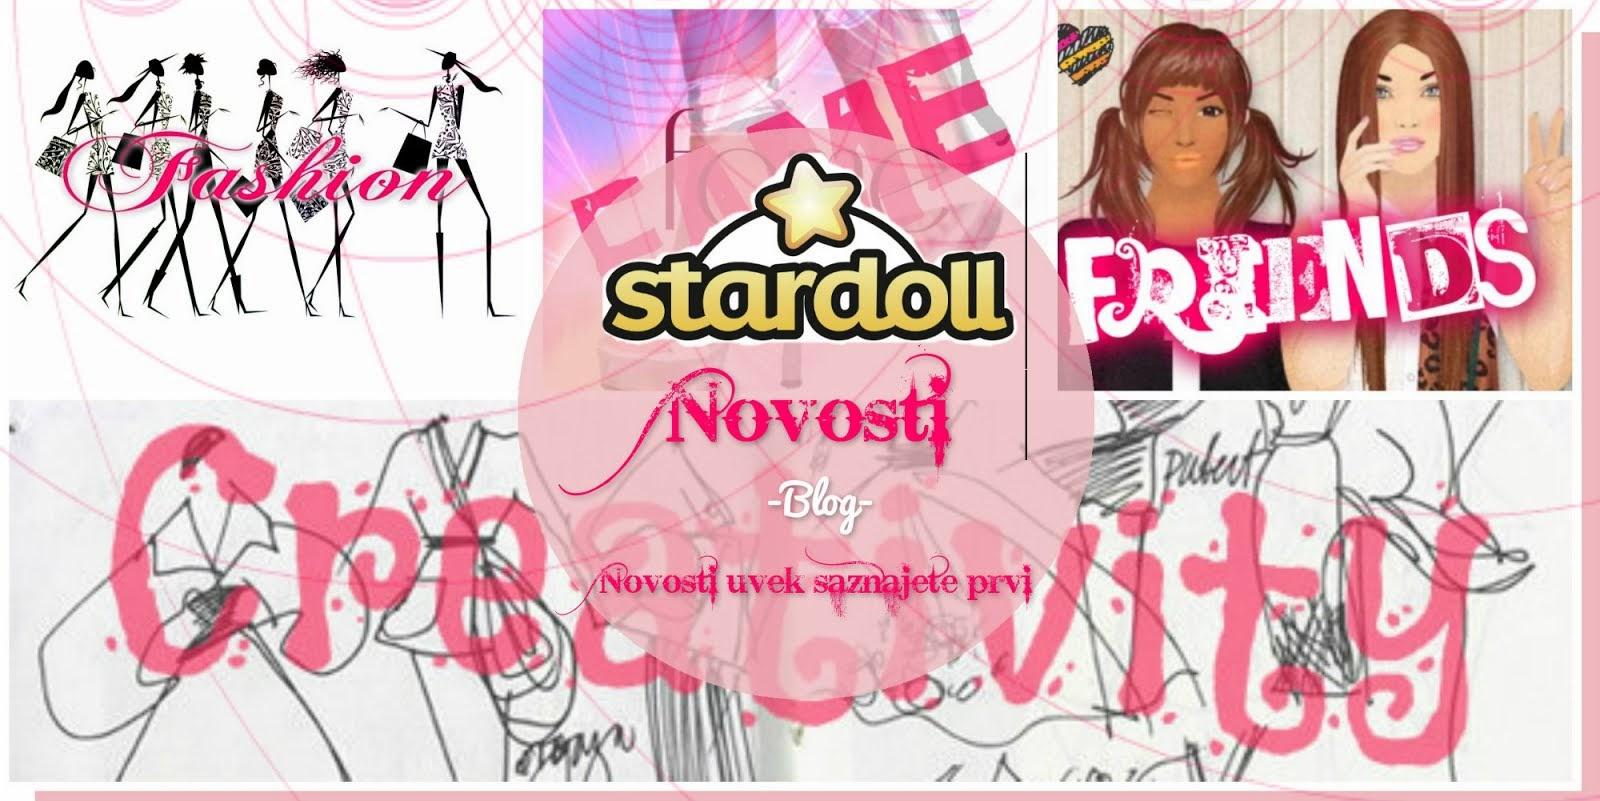 Stardoll novosti Blog